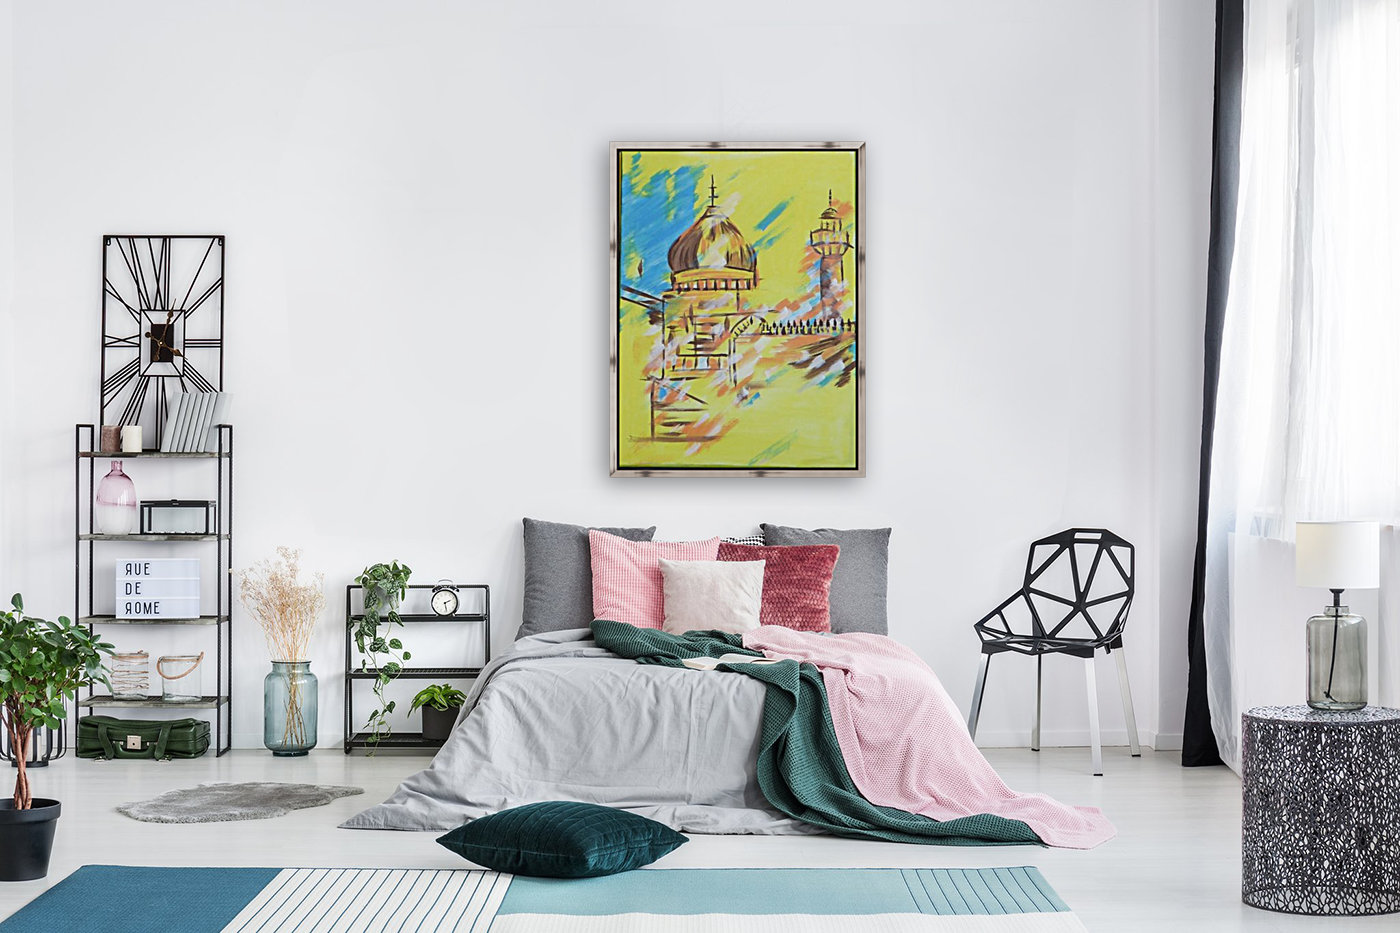 Ahson_Qazi_Geometrical_Islamic abstract artahson_qaziShades_of_DivinityIslamic_Artstretched canvass 12x16  Art